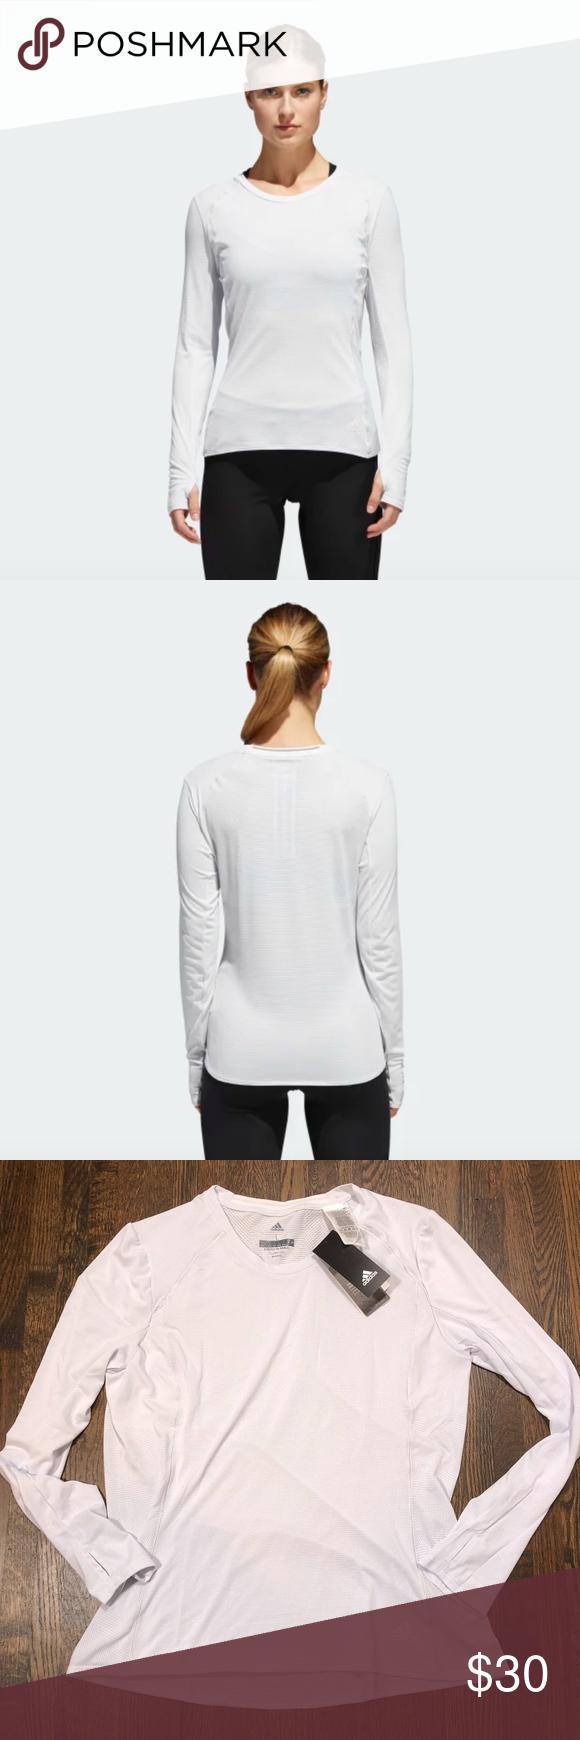 Adidas Supernova Long Sleeve Tee Size XS S L adidas Womens